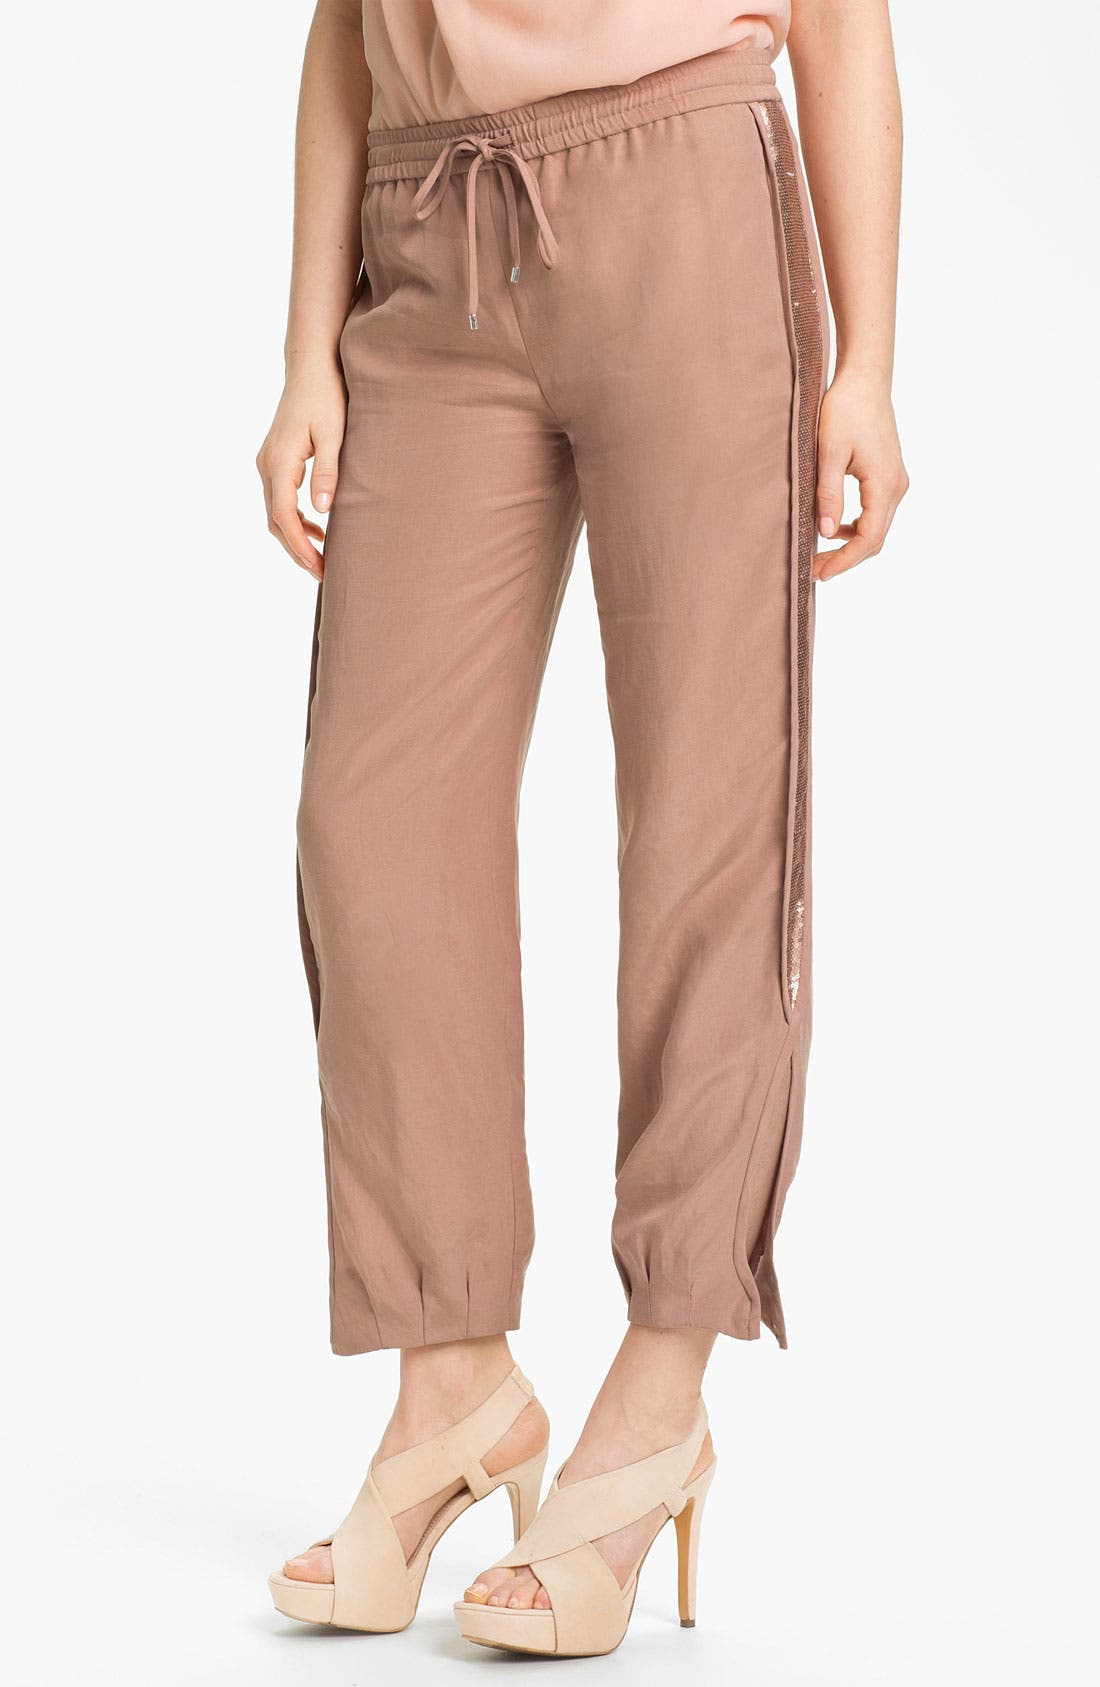 Main Image - Diane von Furstenberg 'Kamaris' Sequin Tuxedo Stripe Pants